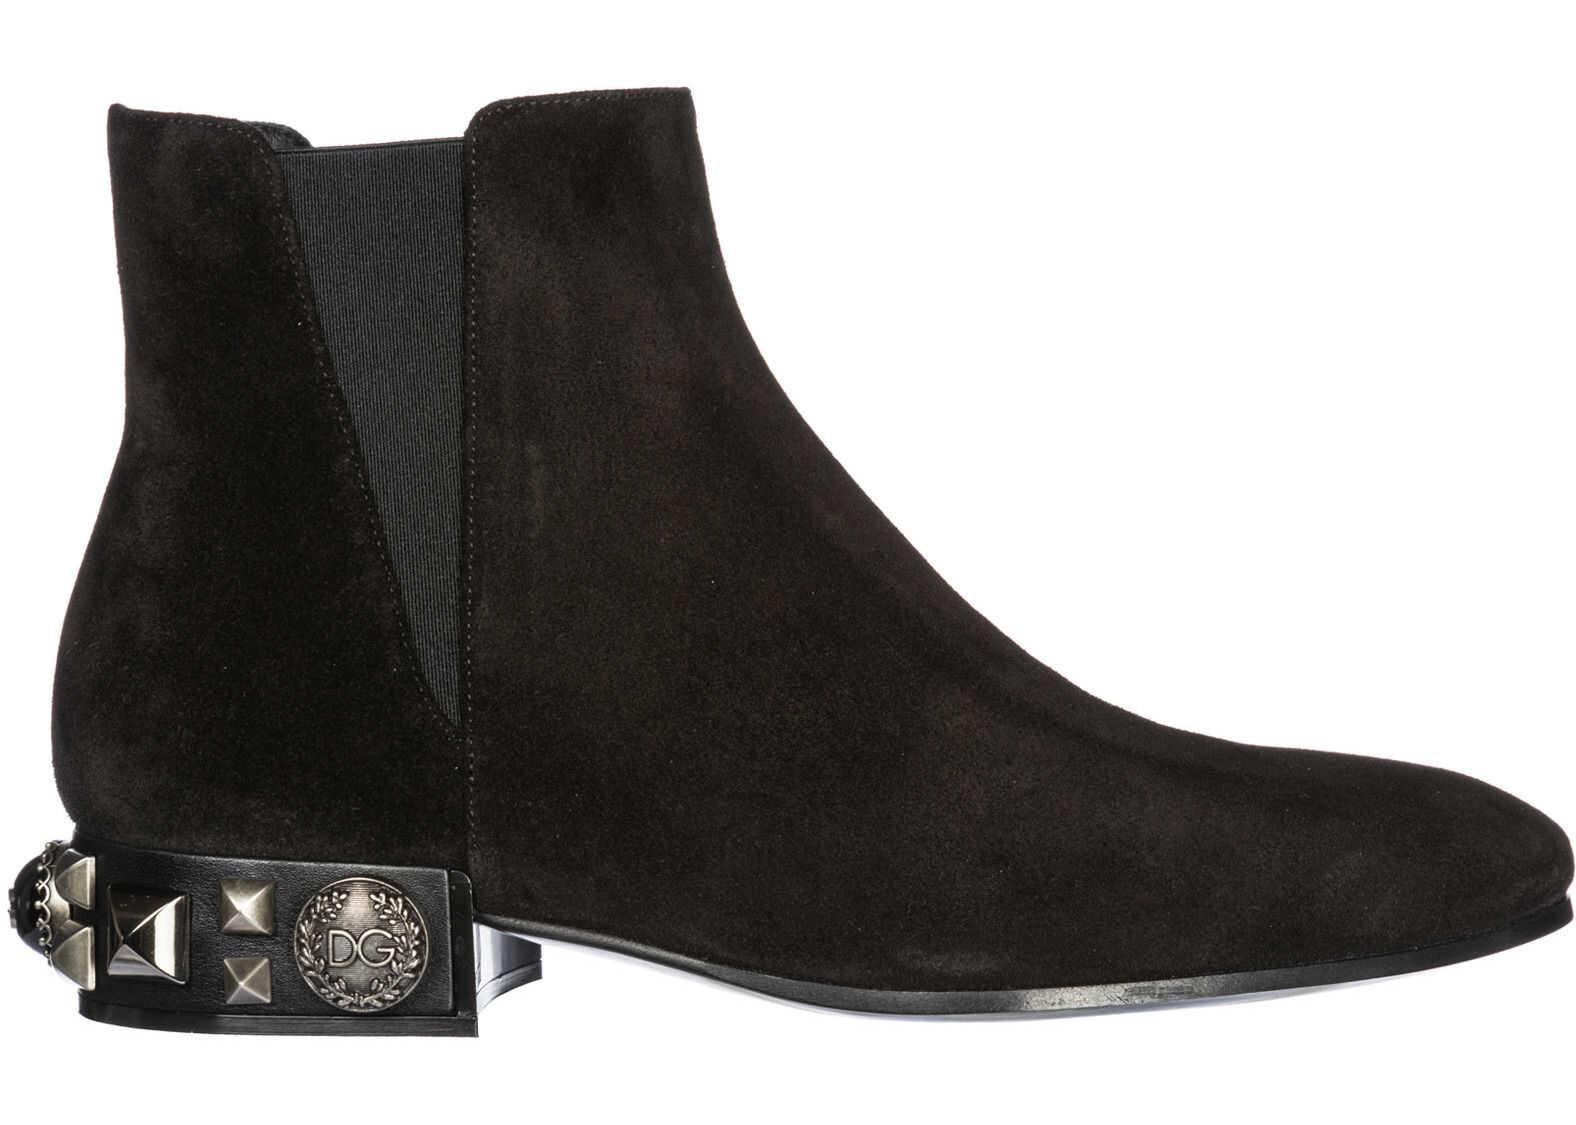 Dolce & Gabbana Booties Napoli Black